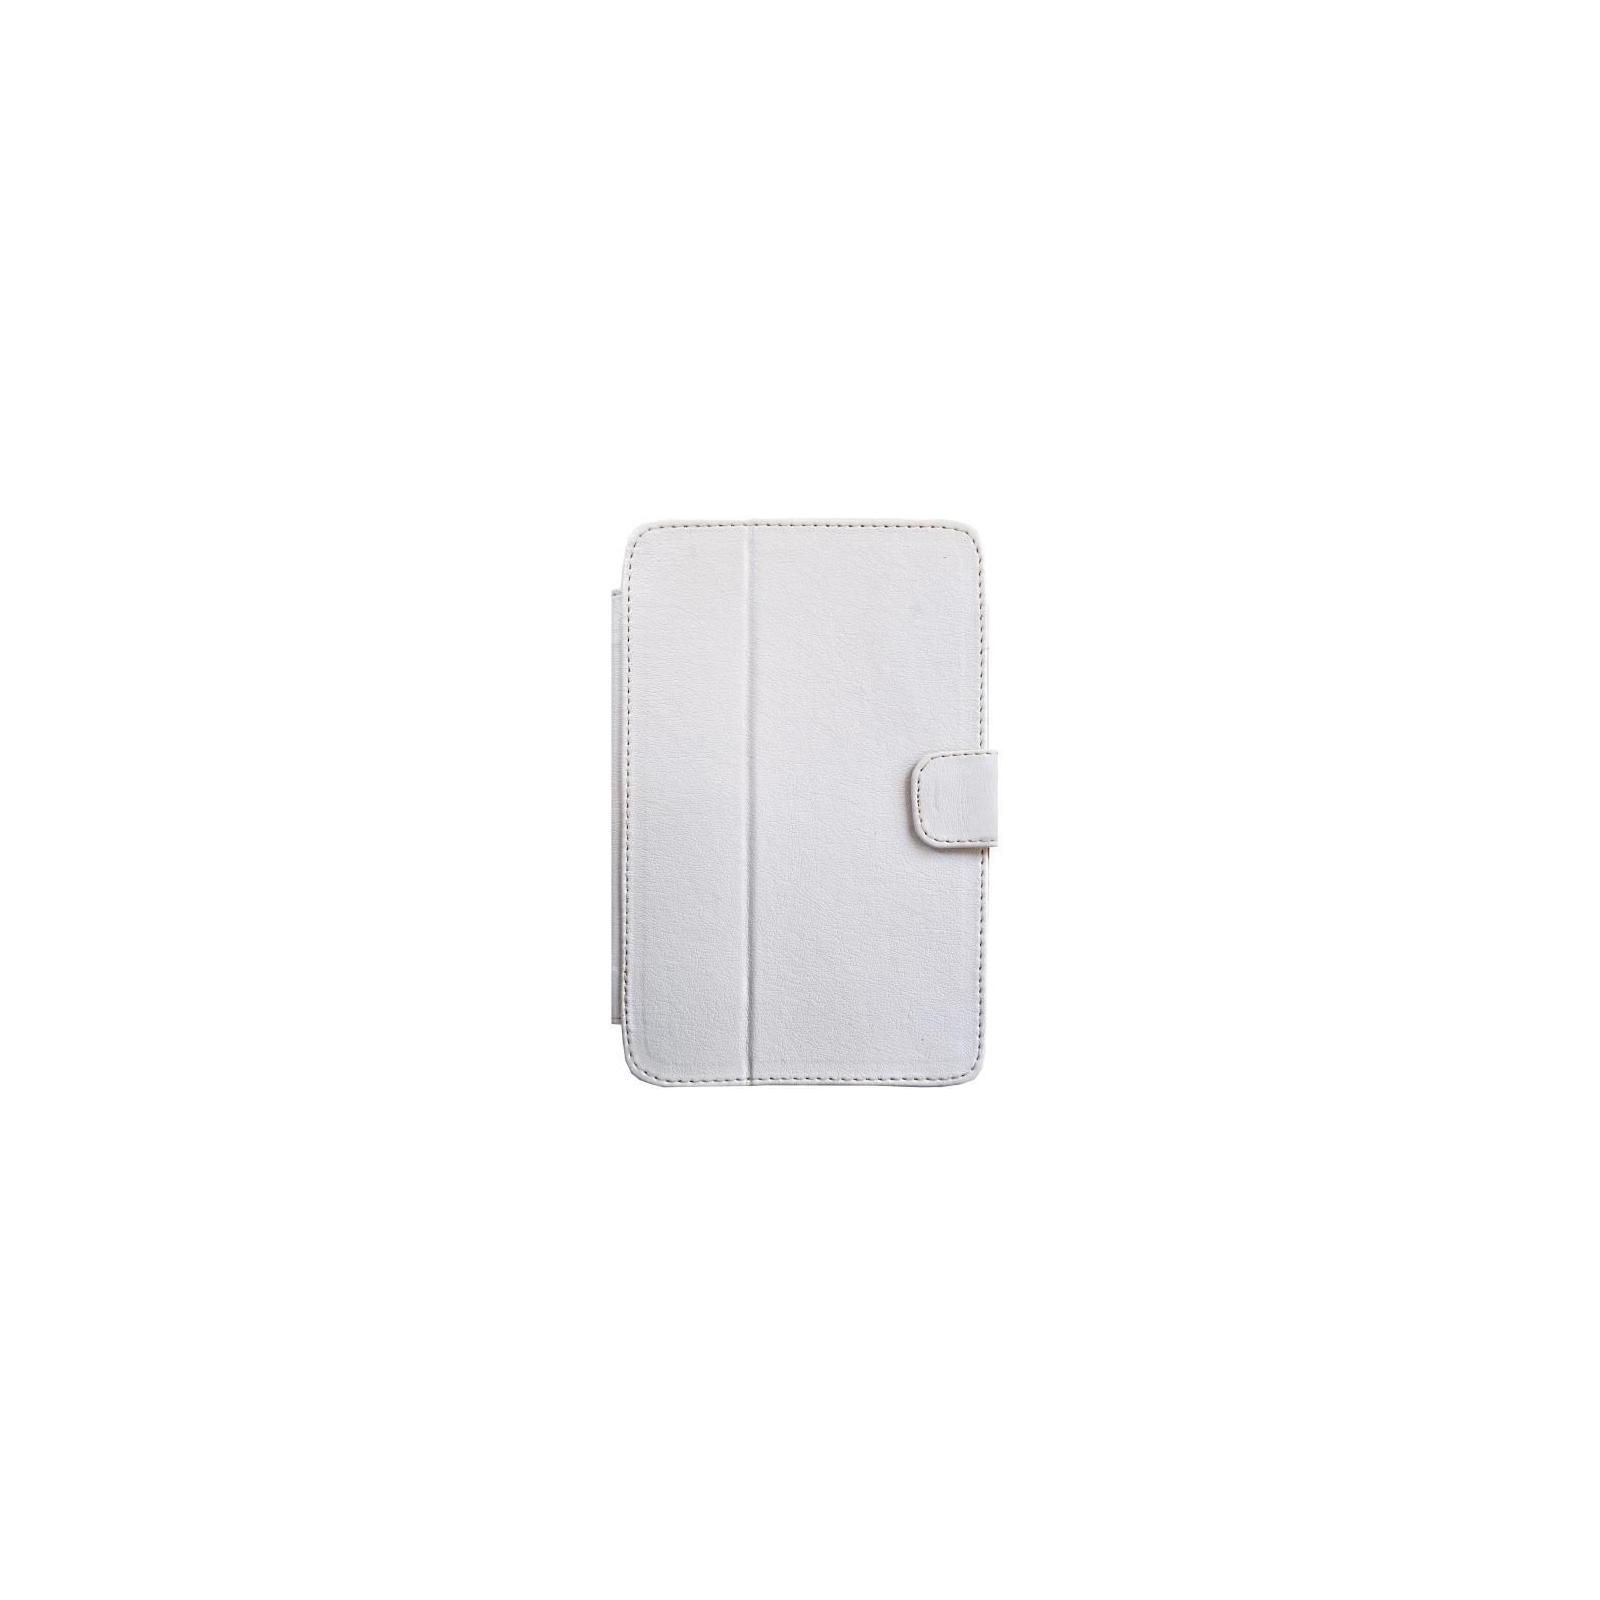 Чехол для планшета Vento 10.1 COOL - white